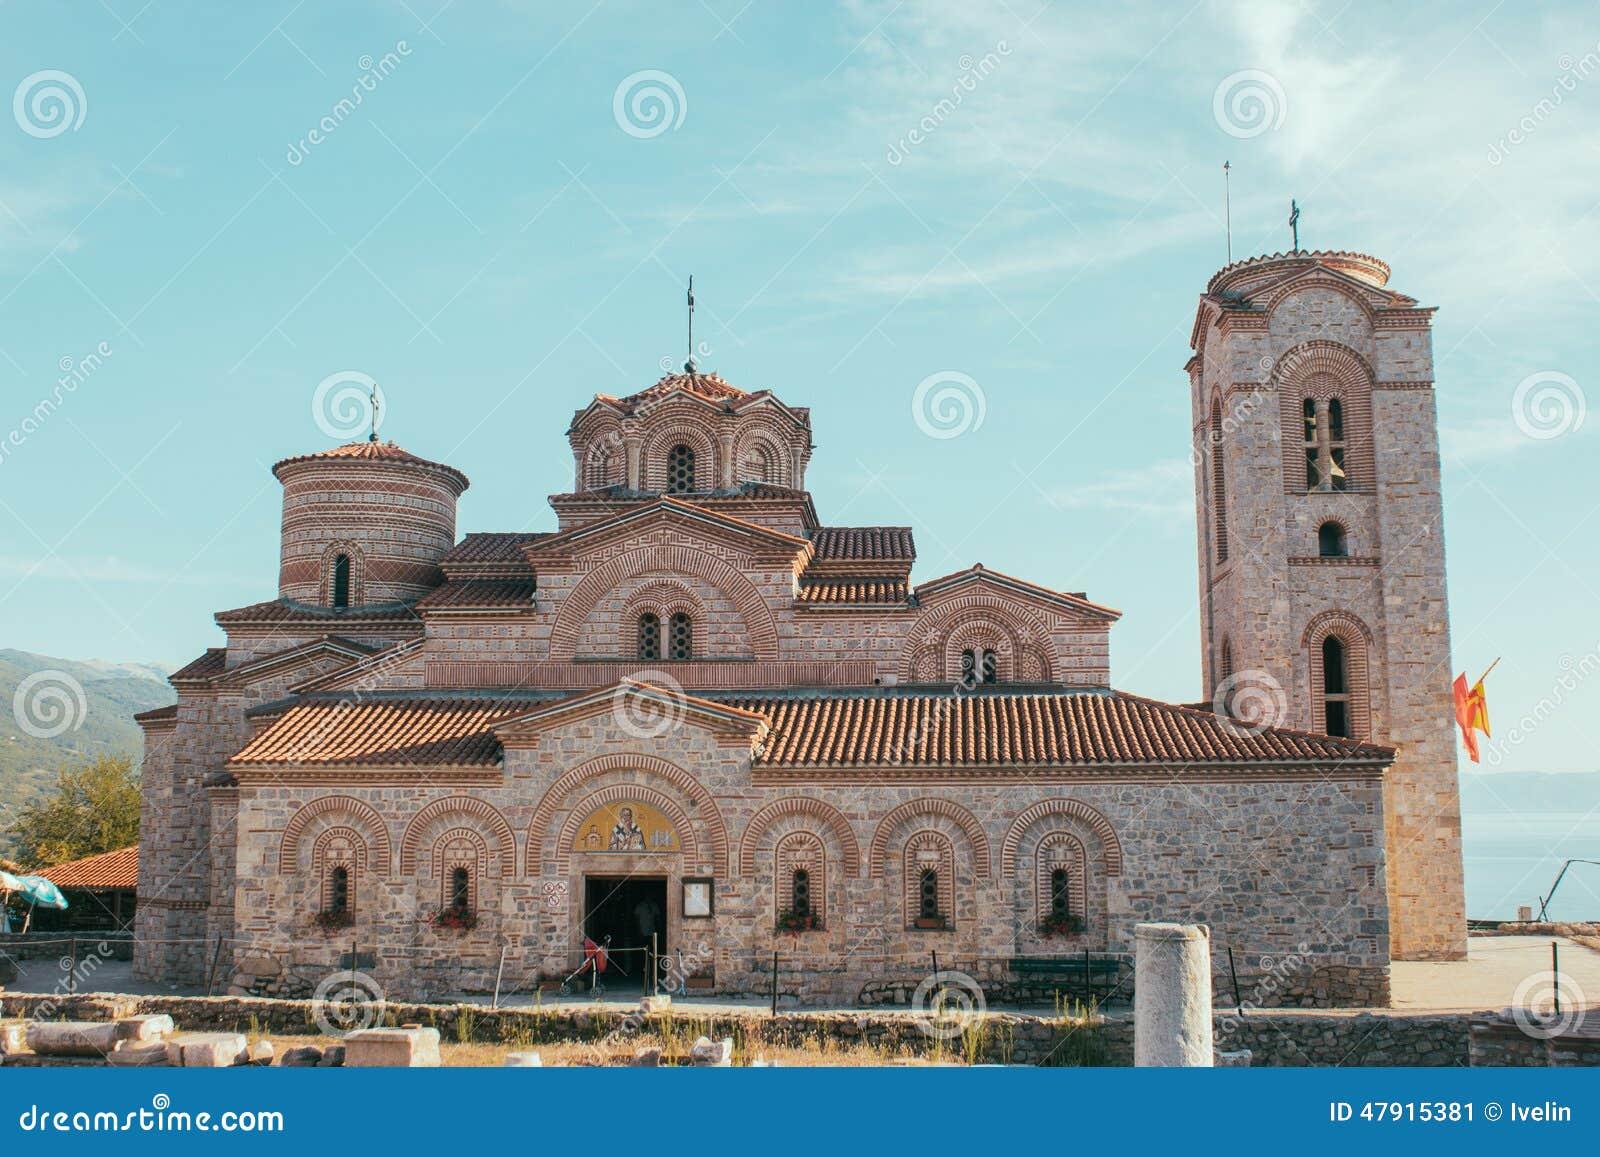 St Clement Ohrid Macedonia Royalty Free Stock Photography Cartoondealer Com 24729005